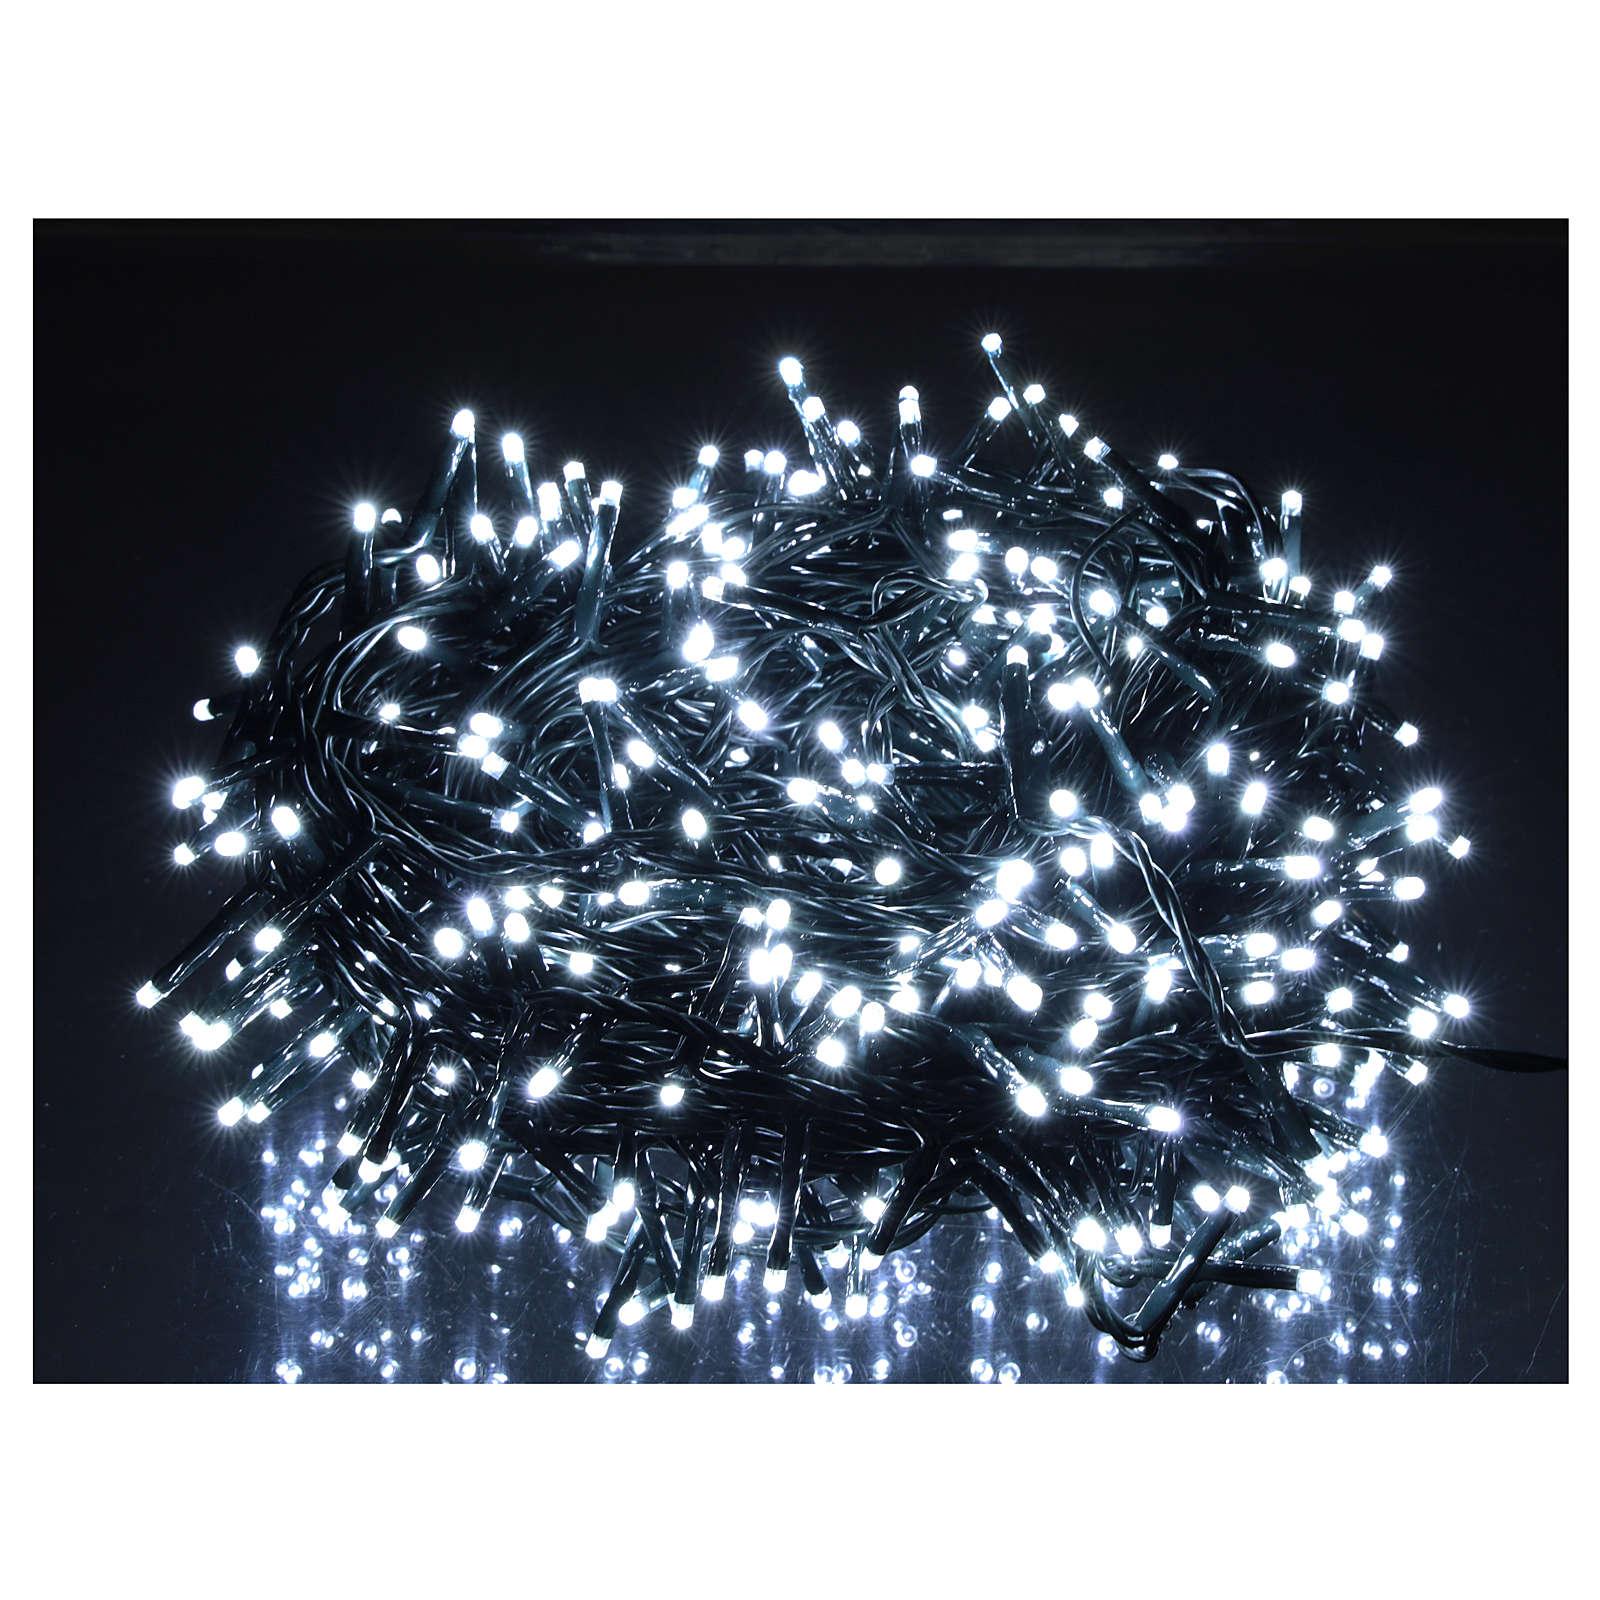 Catena luminosa Natale 500 led bianco freddo telecomando esterno 220V 3